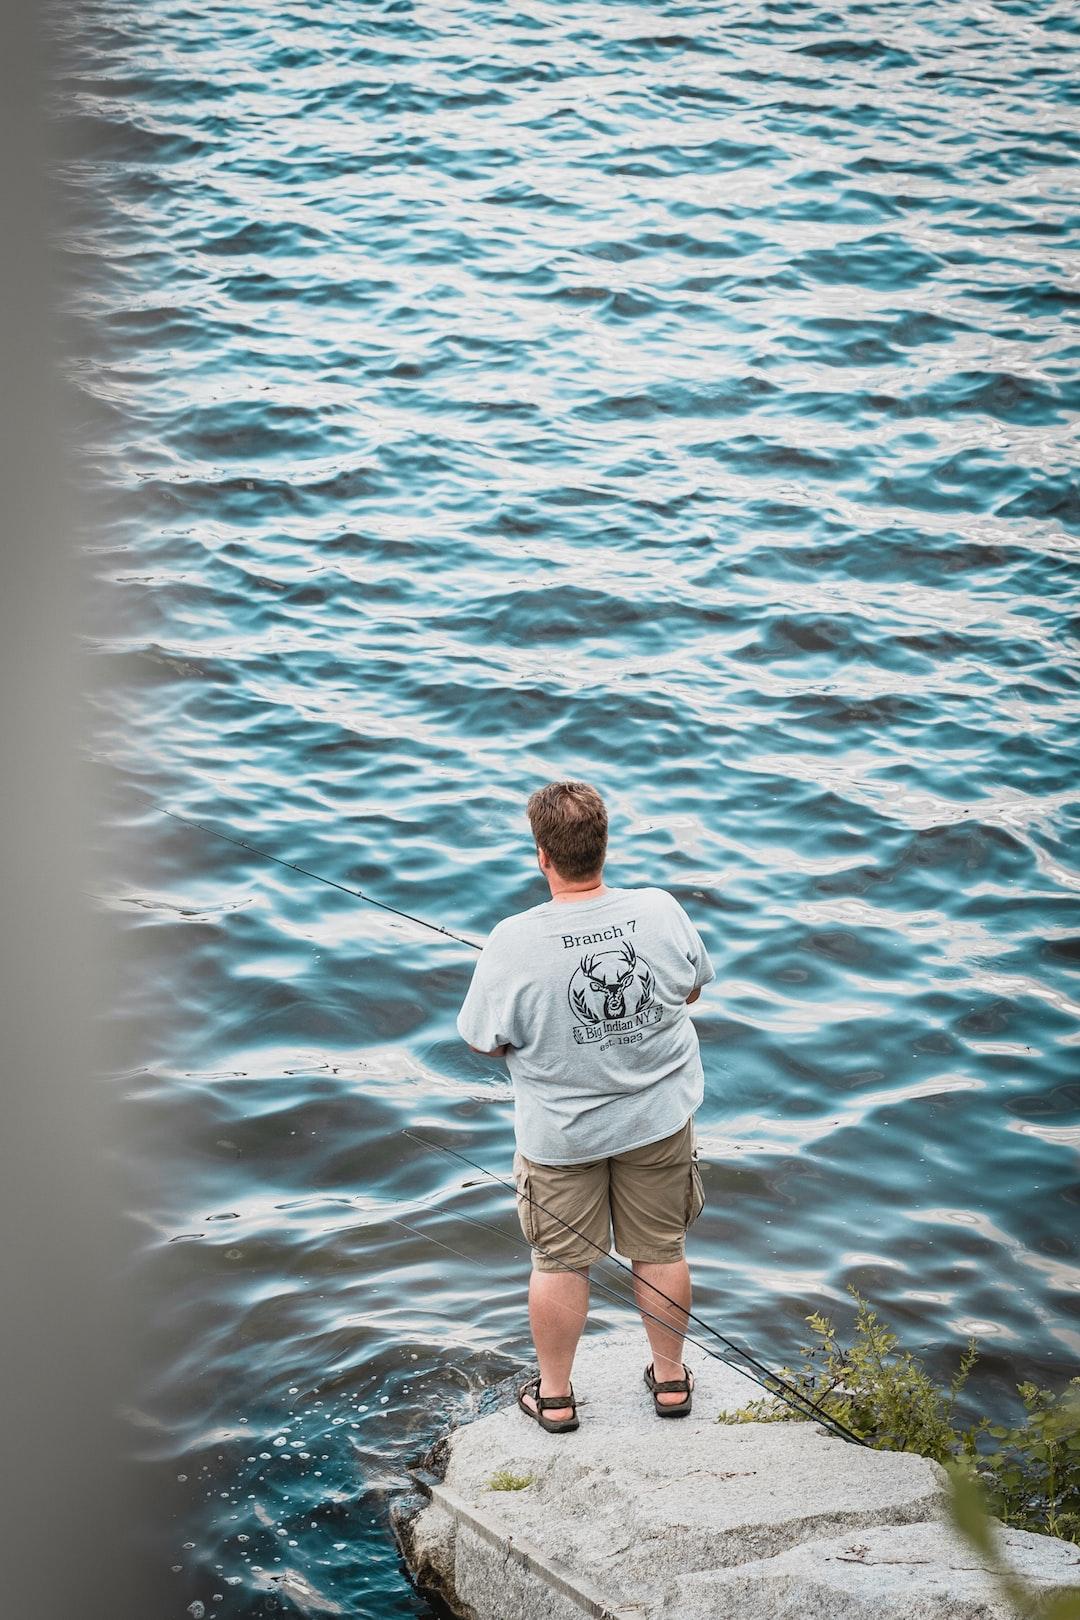 Fisherman zone